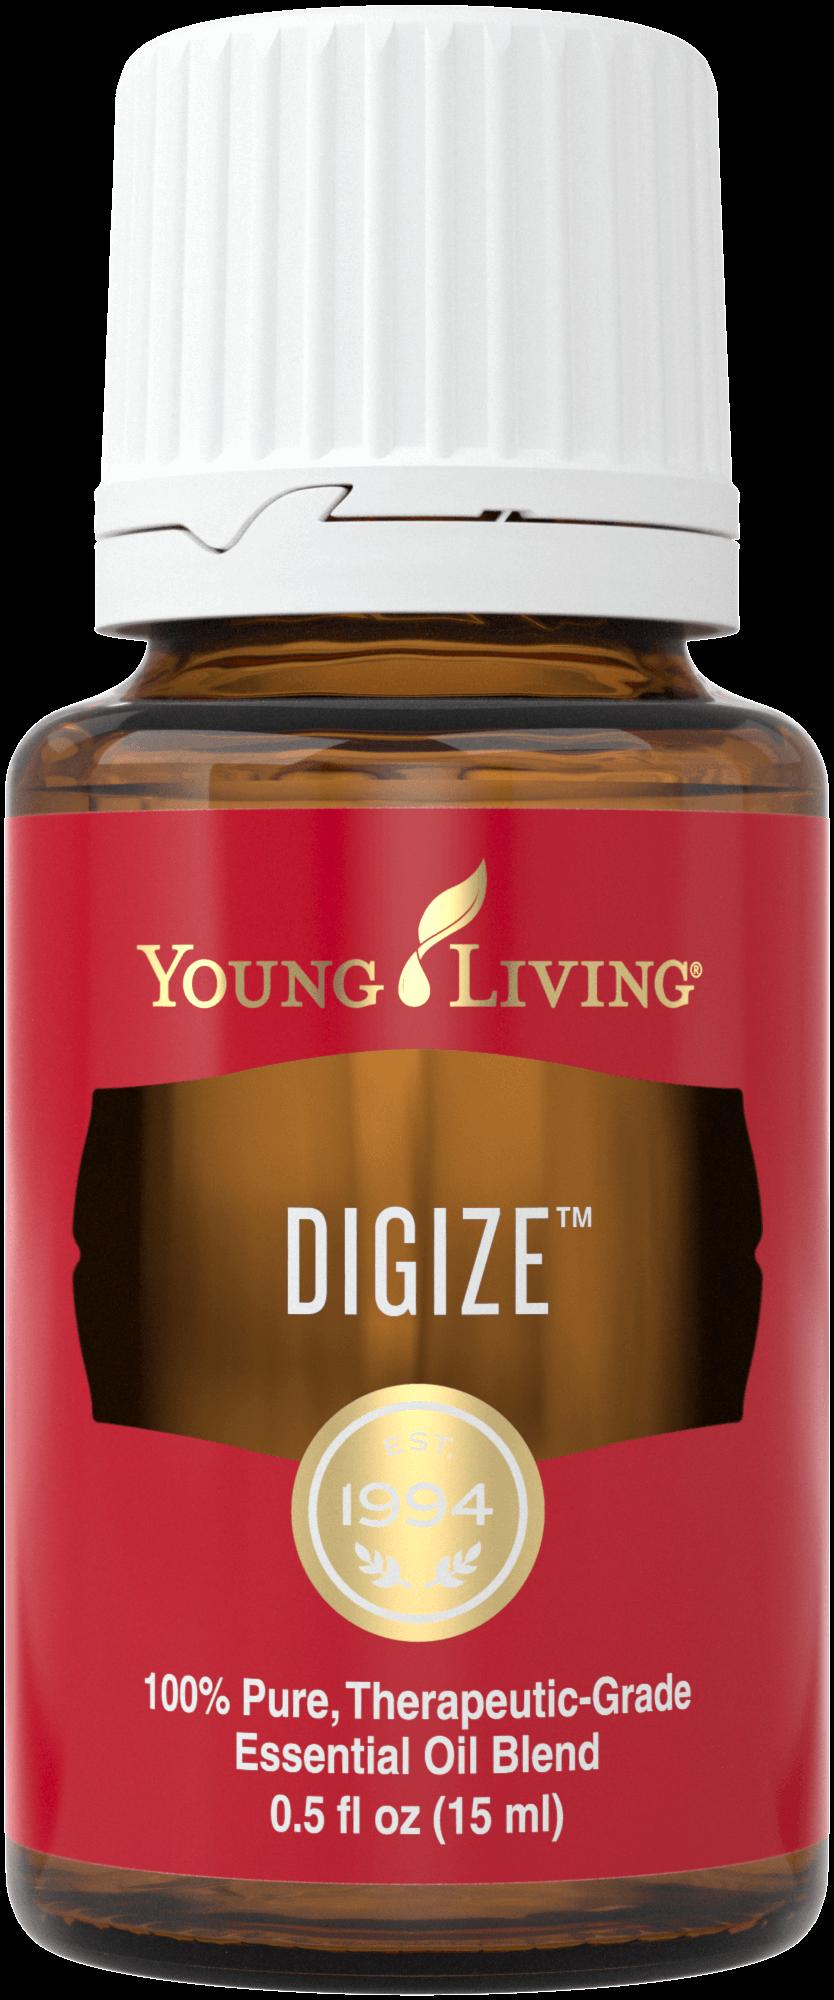 Ätherisches Öl Young Living: Di–Gize (Verdauung) 15ml